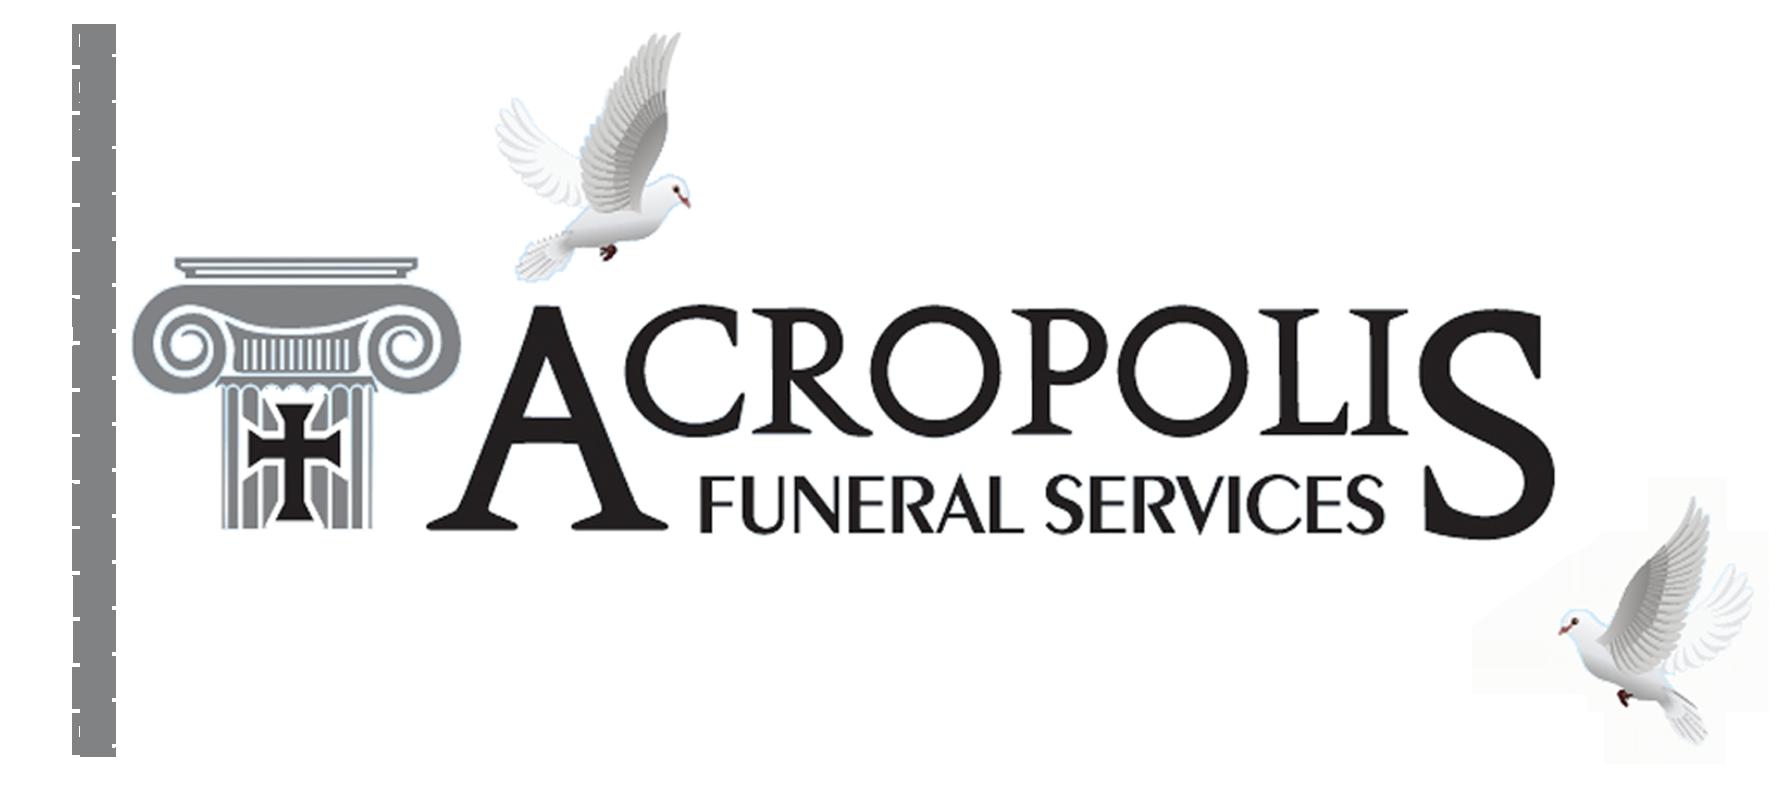 Acropolis Funerals, Greek Funeral Services Sydney, Funeral